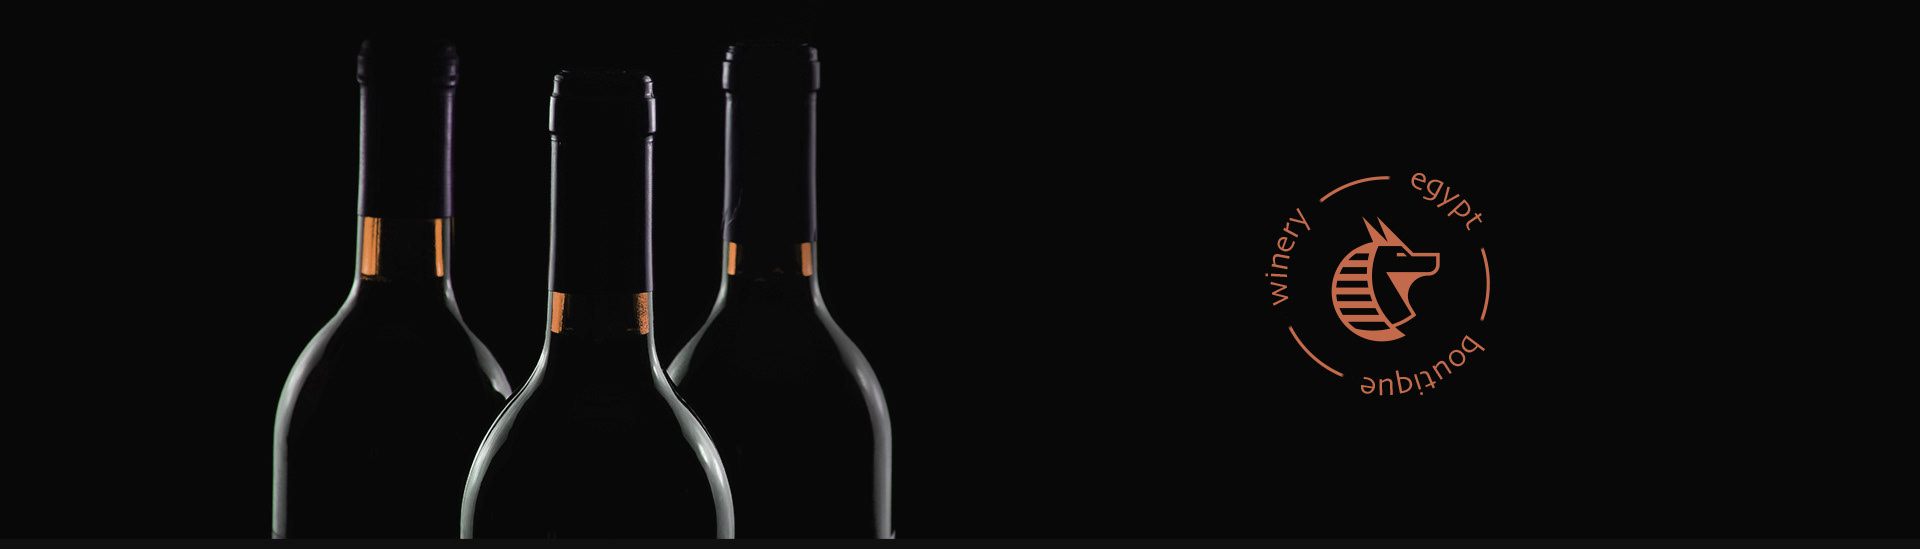 Luiz Arthuso Design Studio - Sibuna - Winery4.jpg